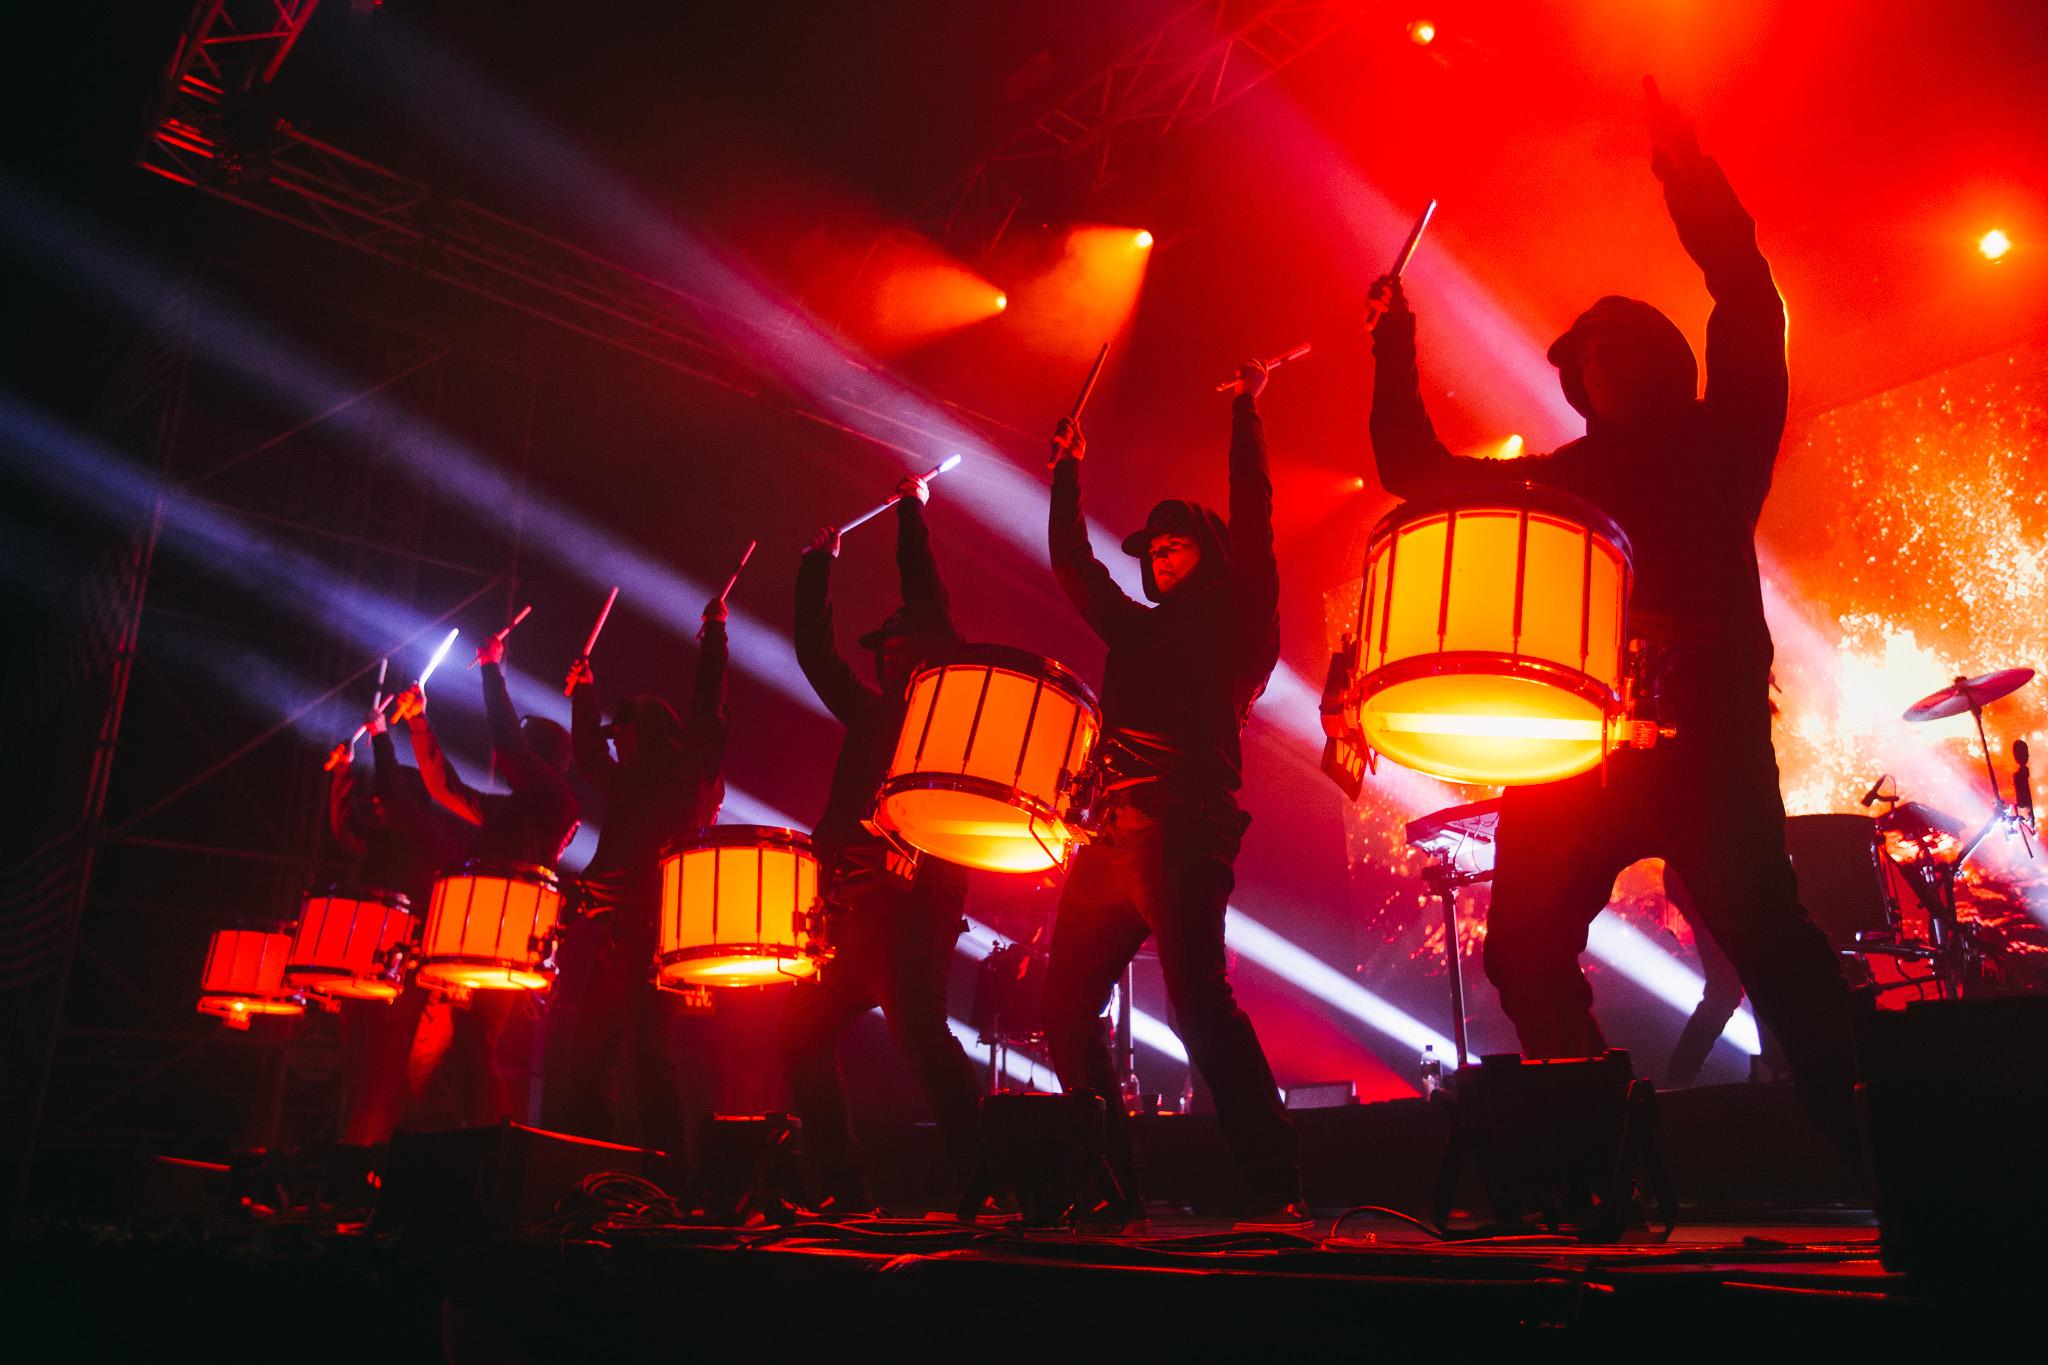 Odesza_Laneway-Festival-Brisbane-2018_Credit-Bianca-Holderness-9.jpg